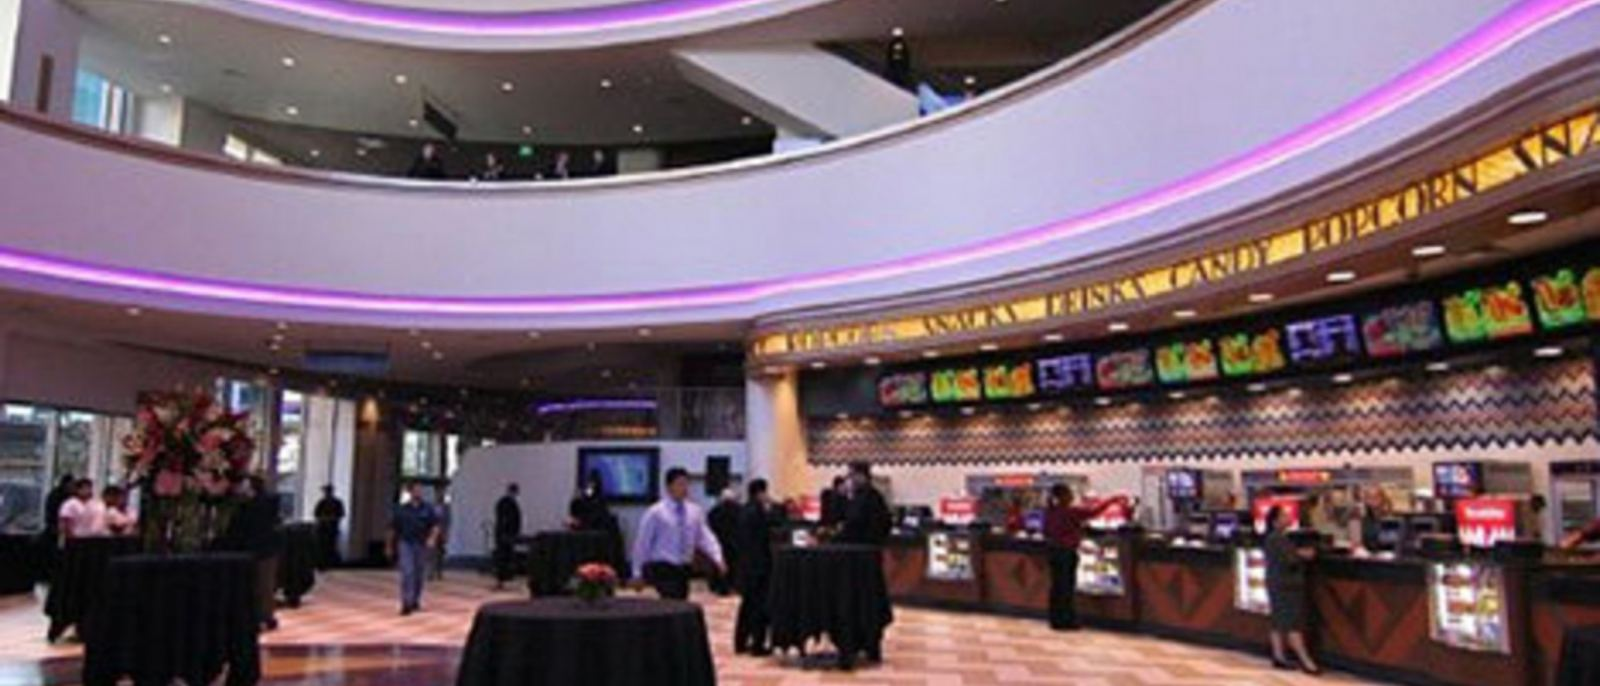 Regal Cinemas L.A. LIVE